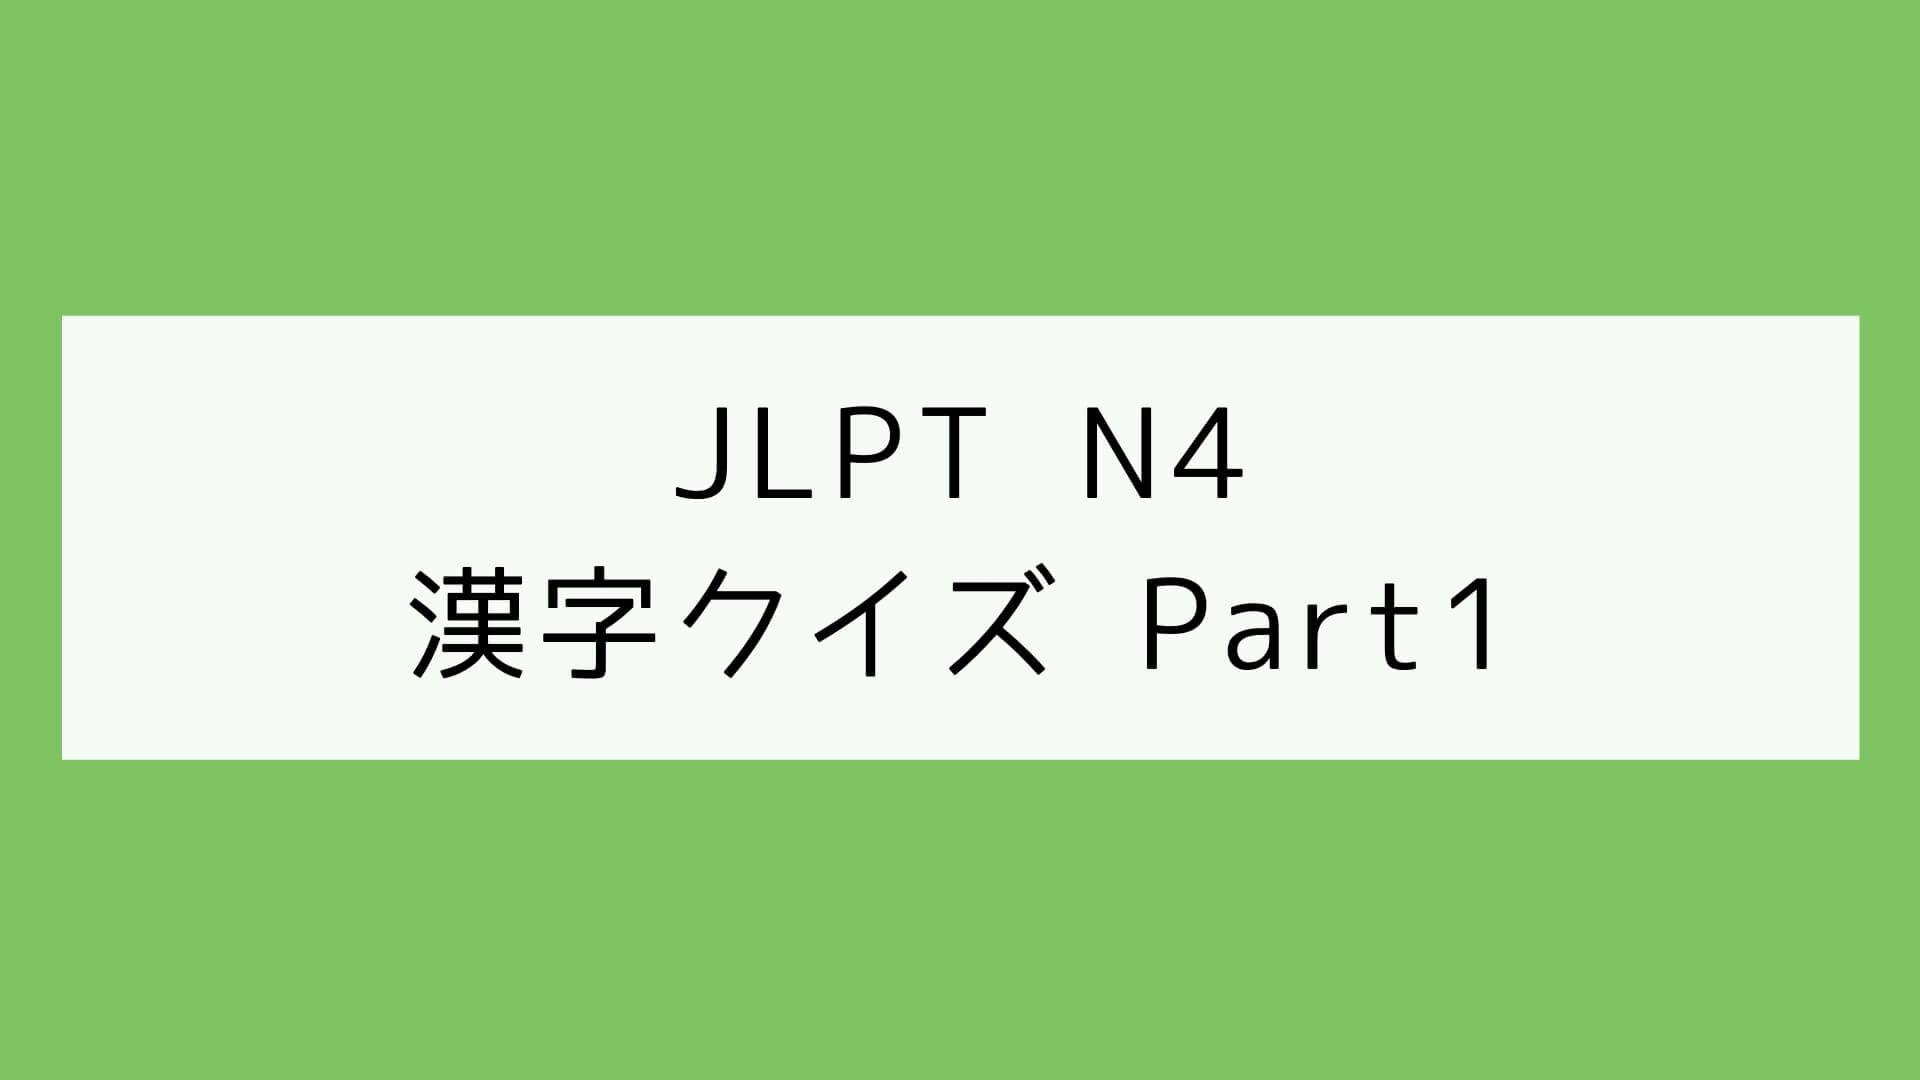 【JLPT N4】漢字クイズ Part1